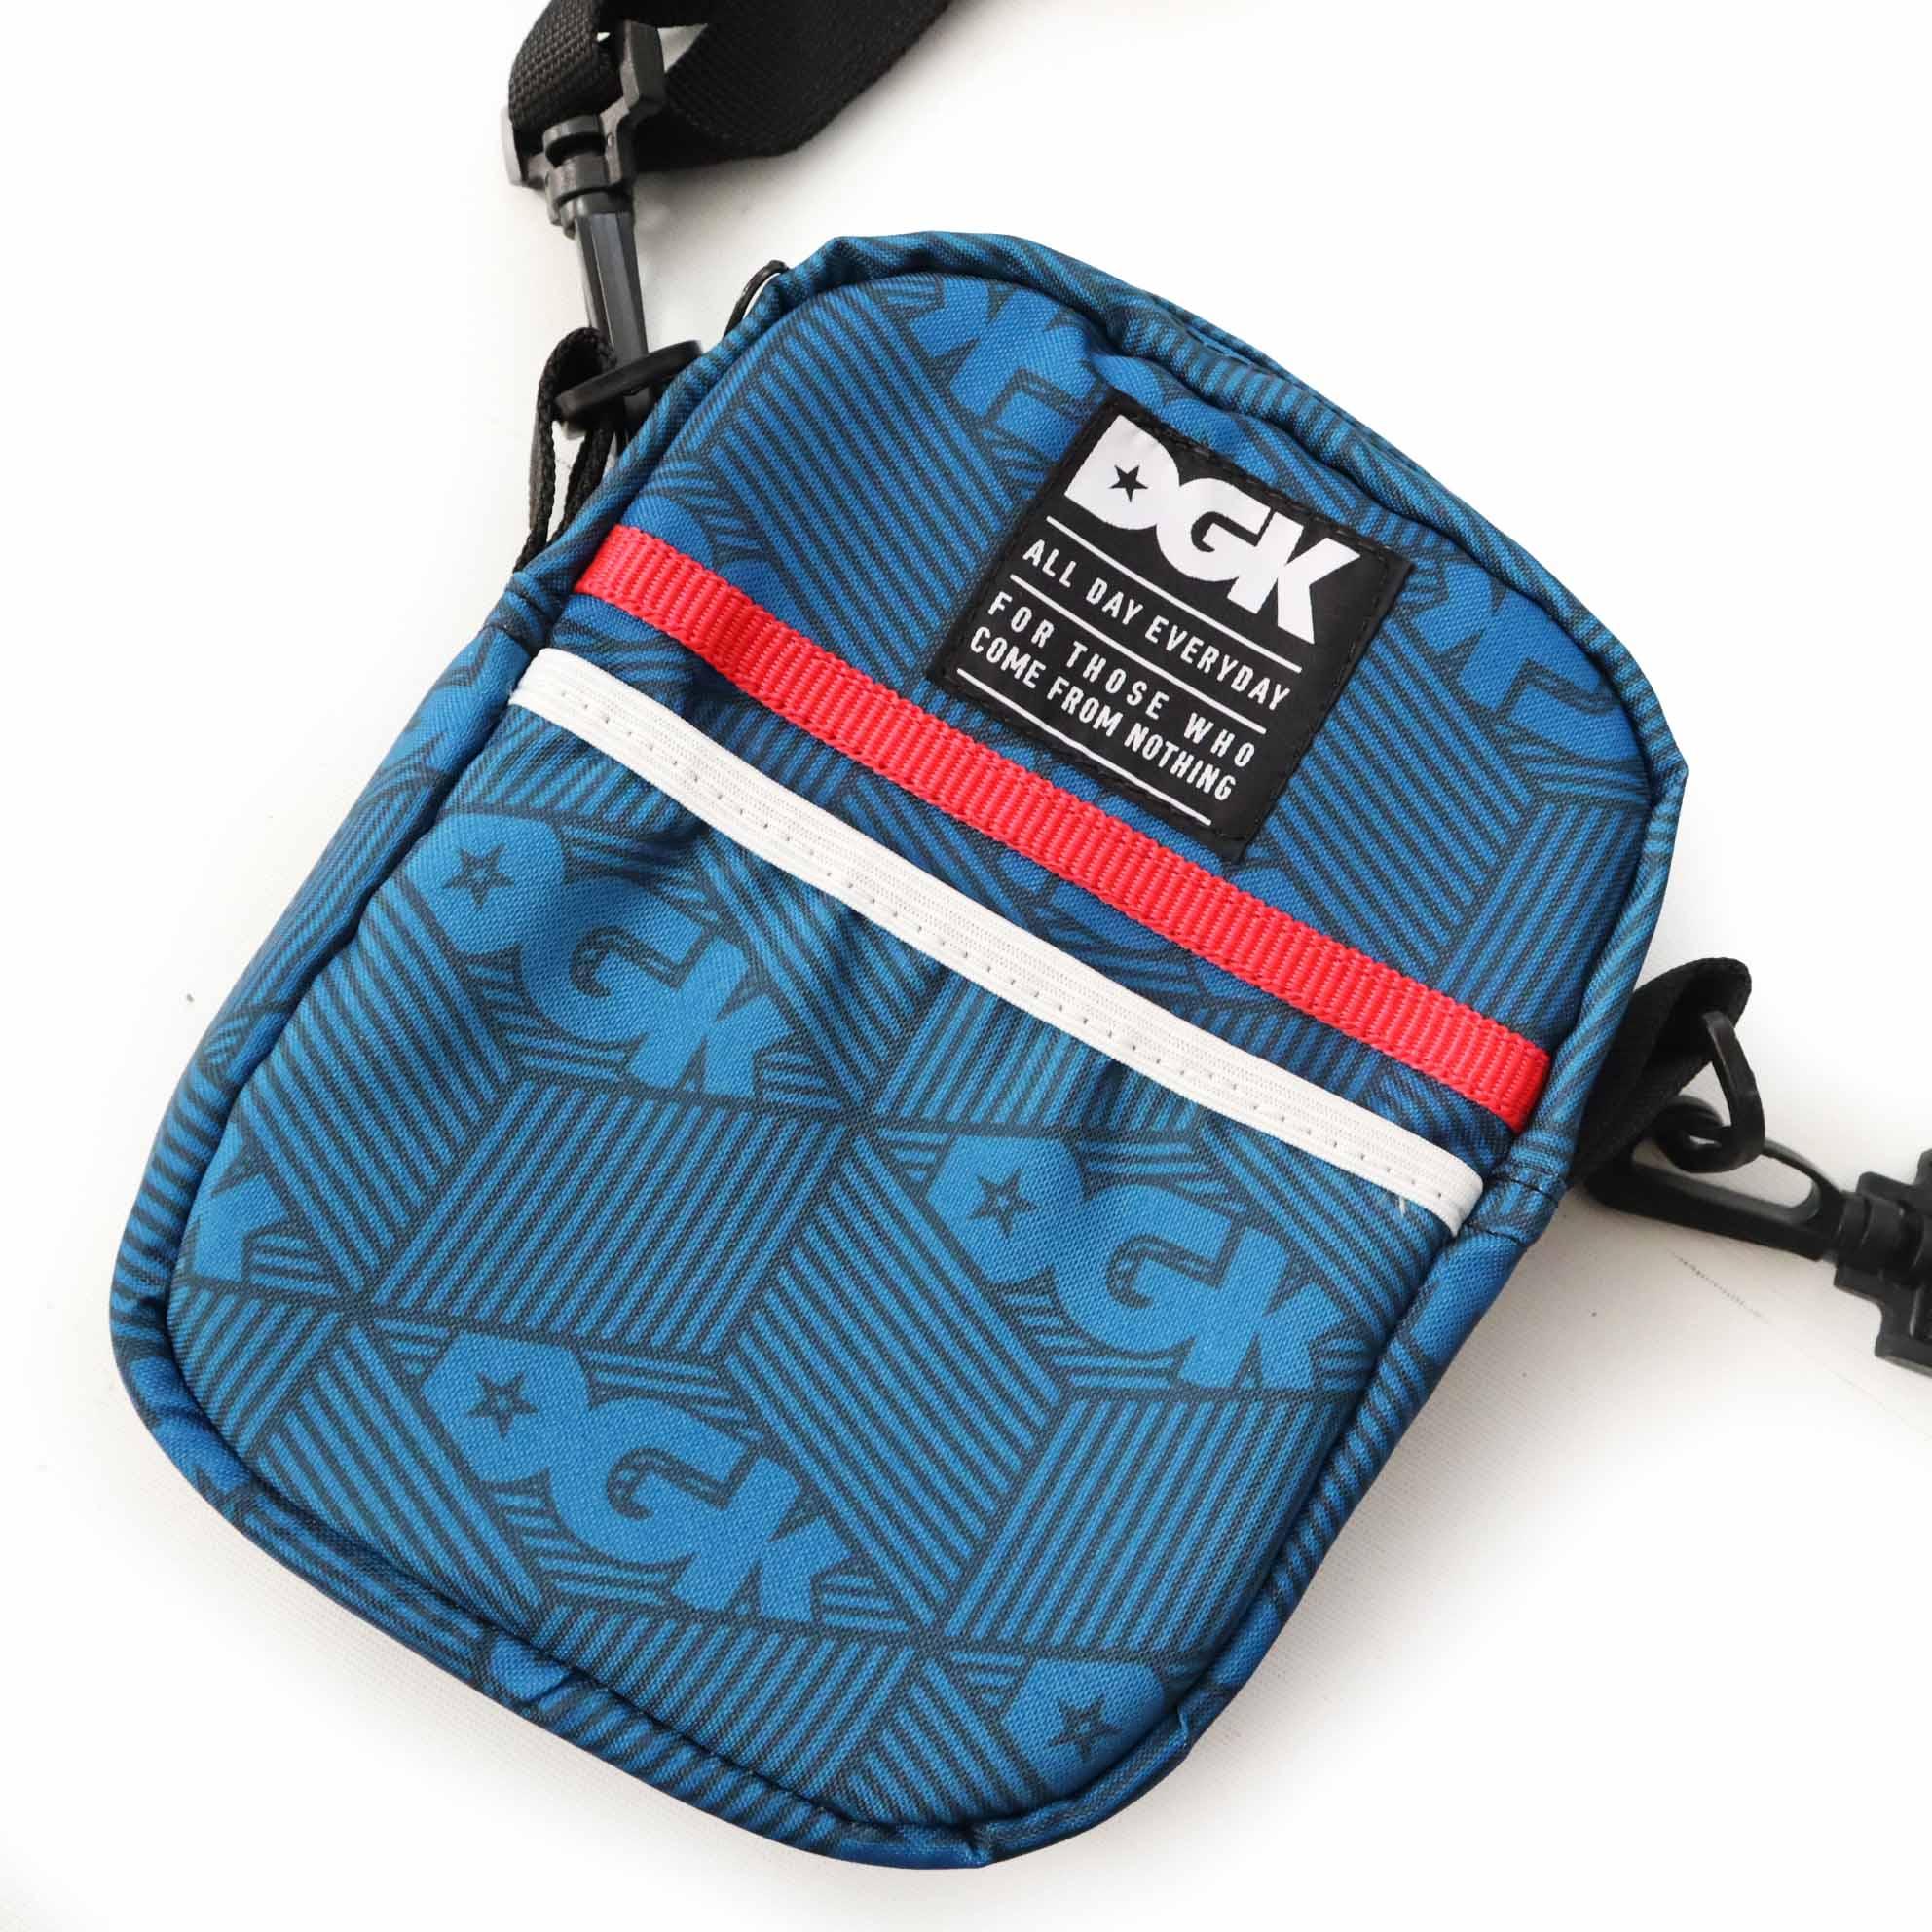 Shoulder Bag DGK Riviera - Azul